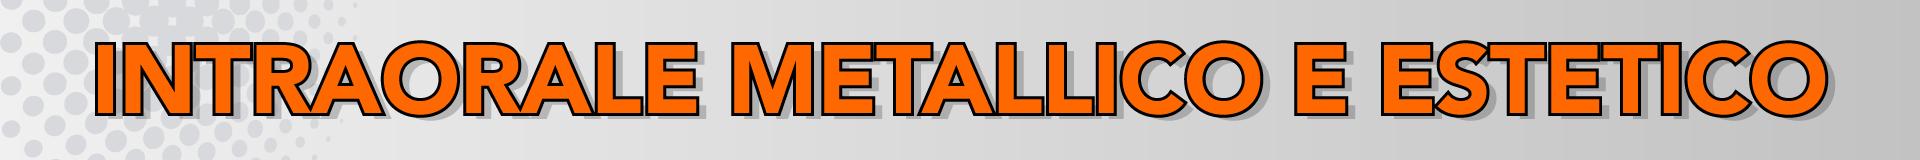 Intraorale metallico ed estetico image